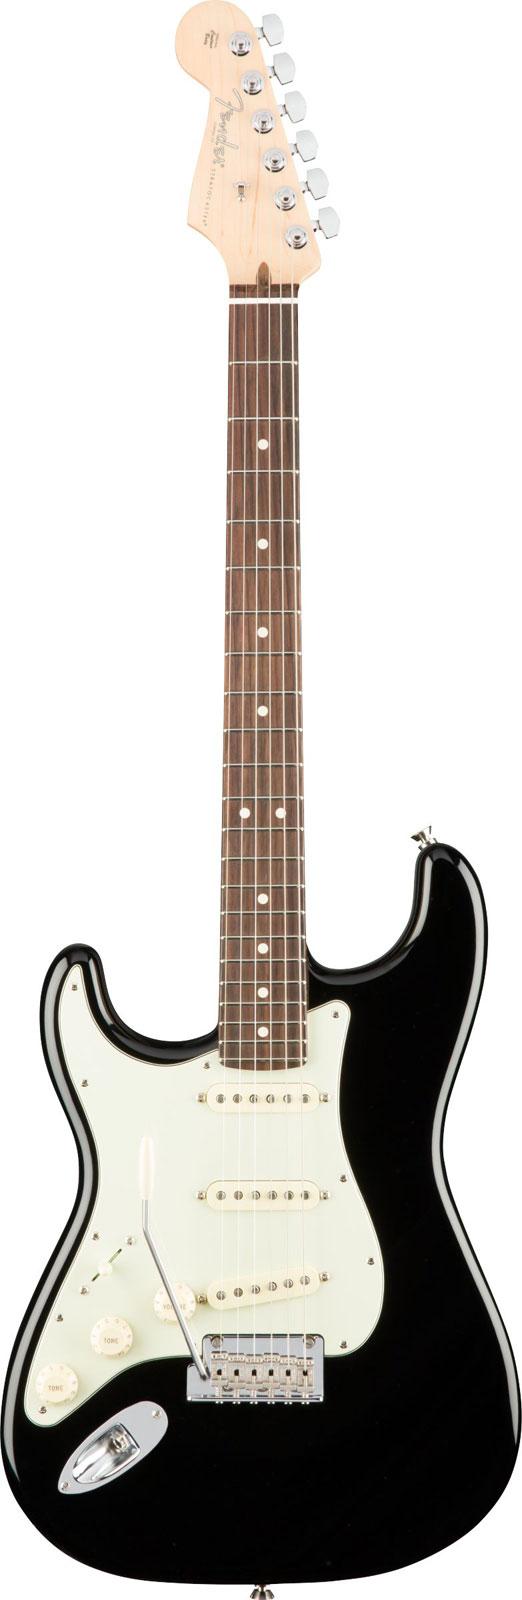 Fender Gaucher American Professional Stratocaster Lh Rw Black